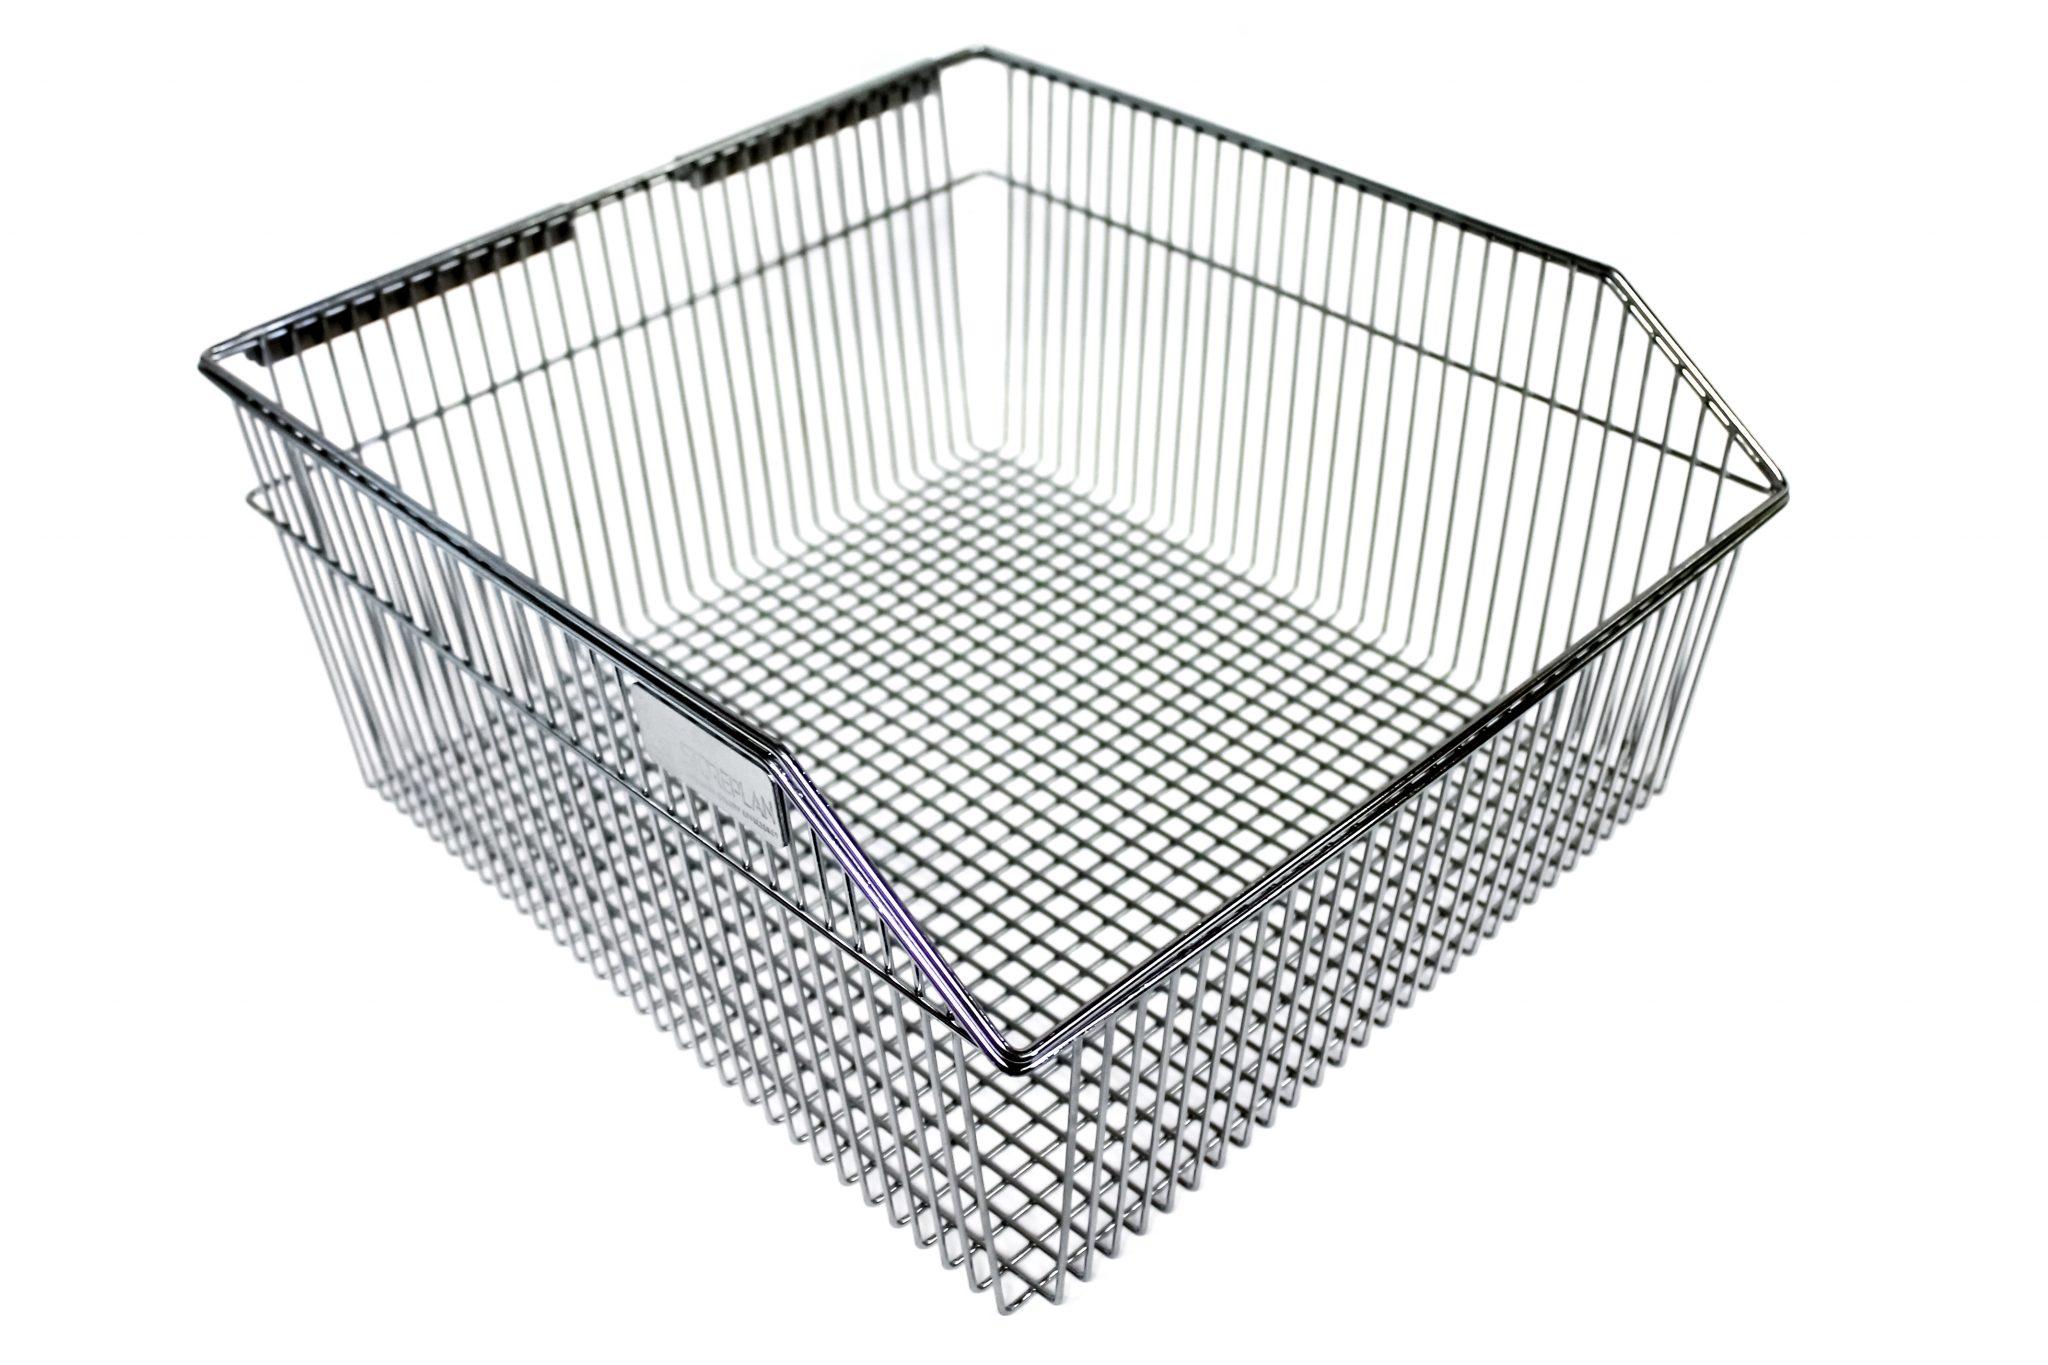 sterimesh wire baskets storeplan. Black Bedroom Furniture Sets. Home Design Ideas